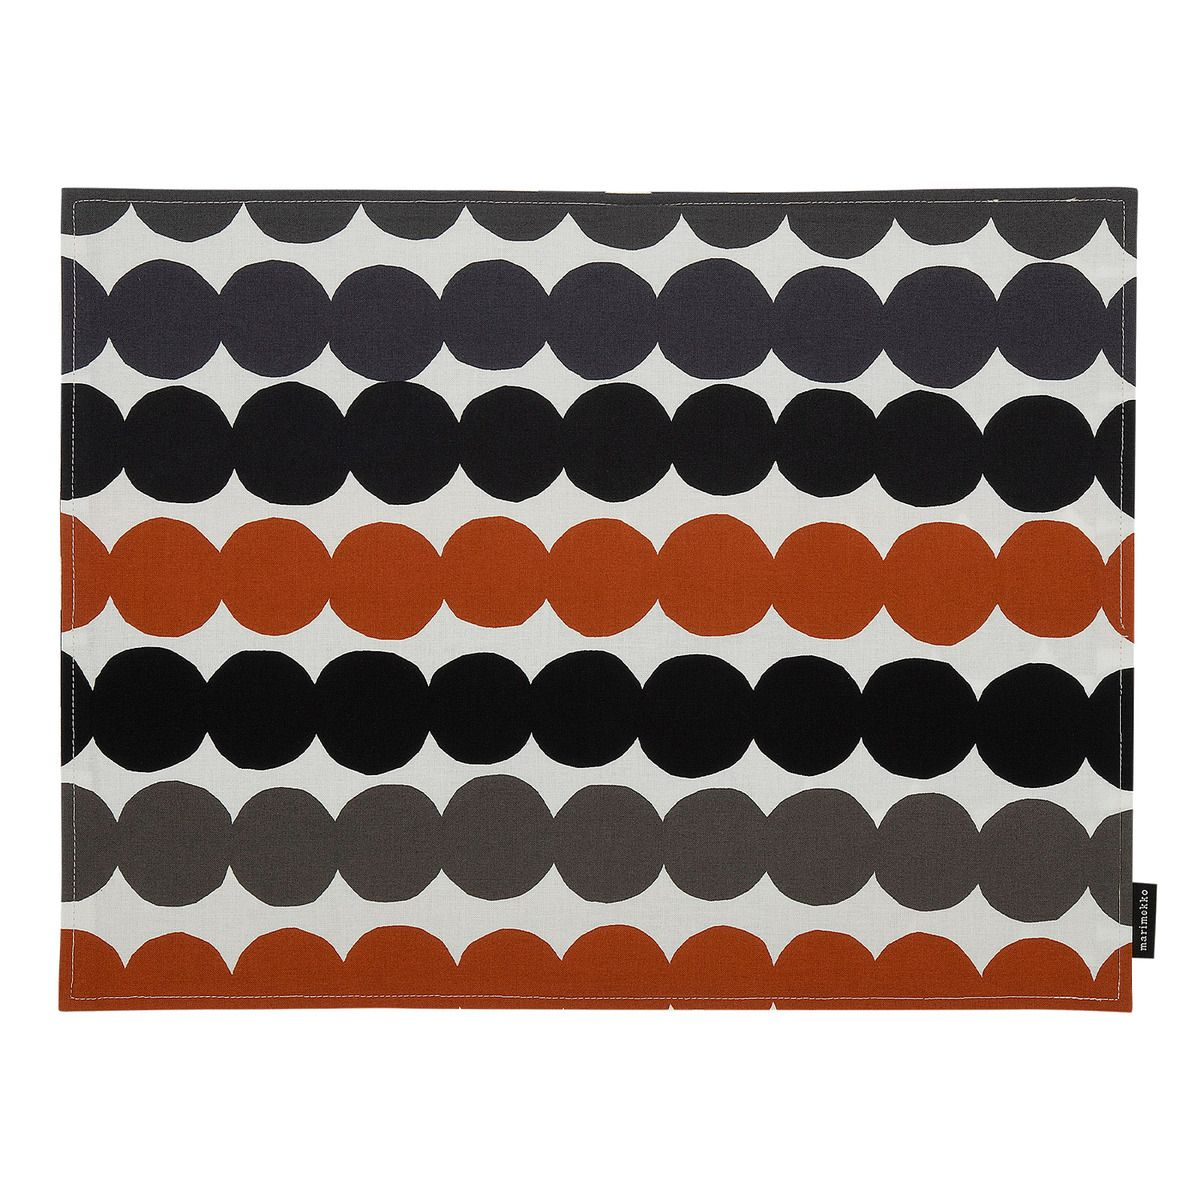 Marimekko S Rasymatto Coated Cotton Placemat Features Maija Louekari S Attractive Pattern Depicting Linen Placemats Textile Prints Design Nordic Design Bedroom